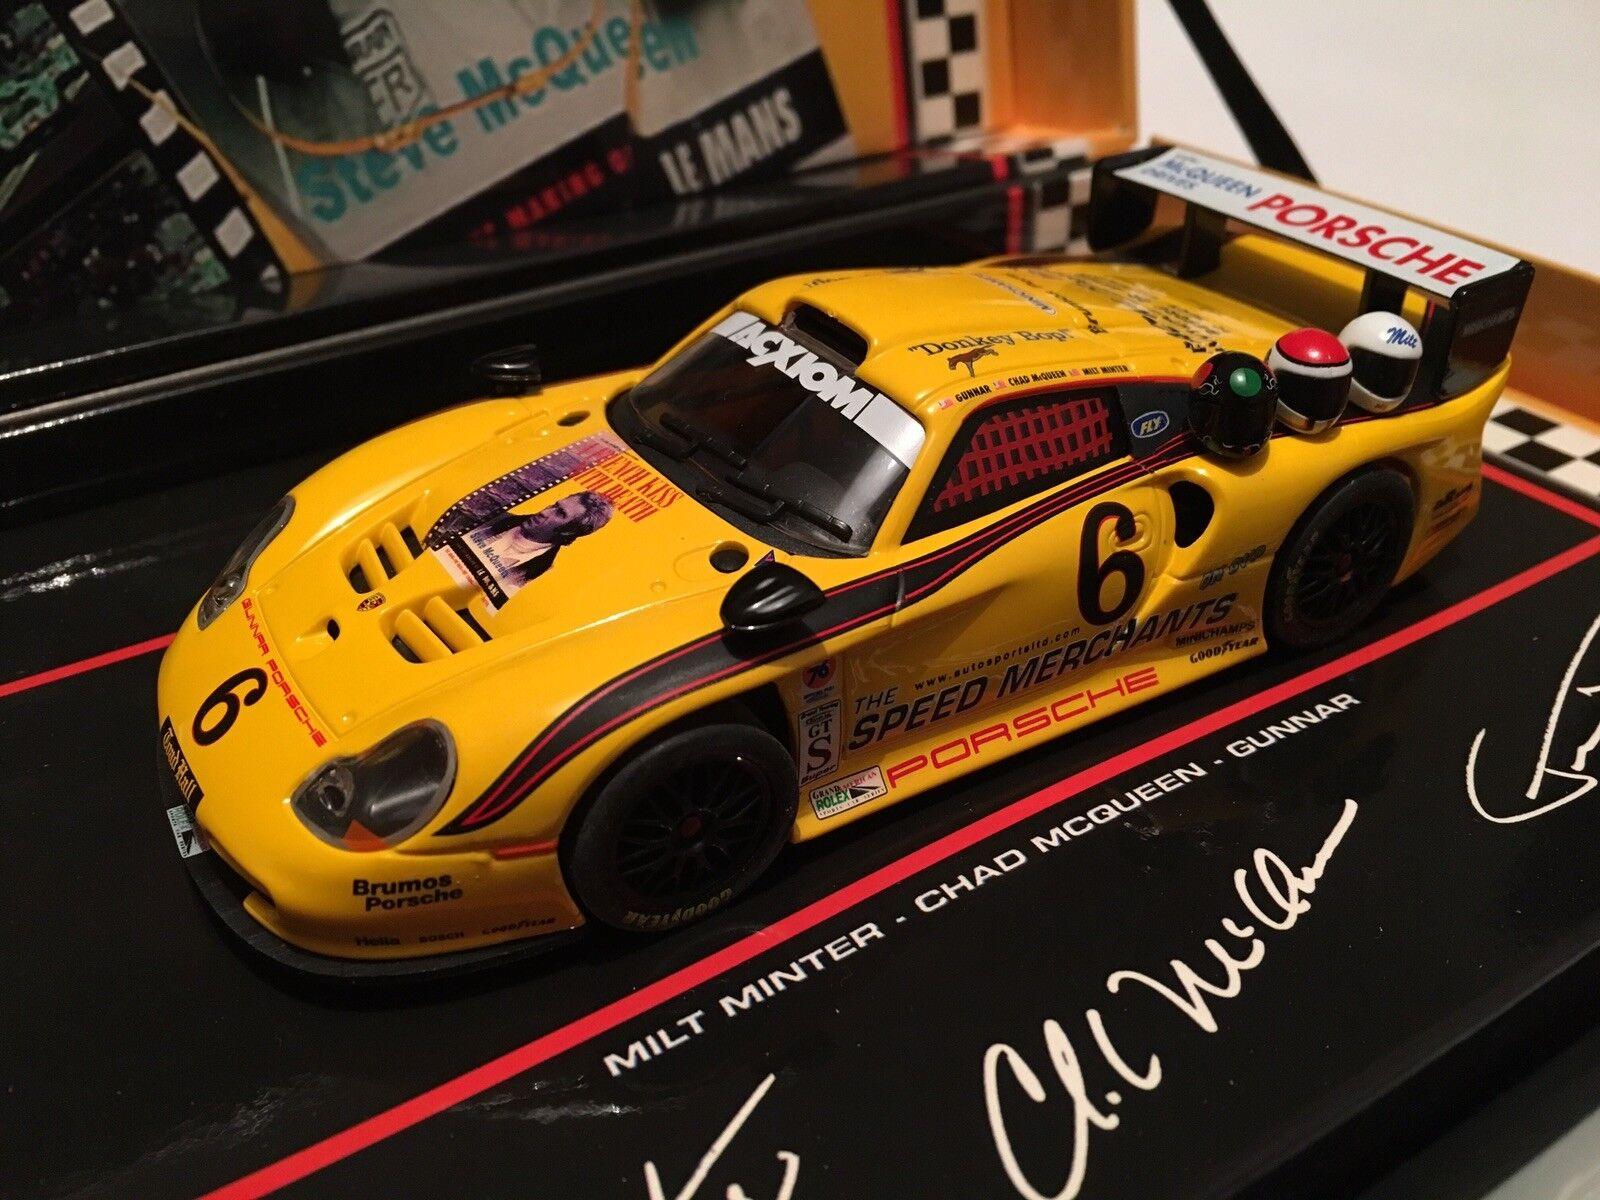 Fly Slot Car Ref 96037 Porsche 911 GY Evo Daytona Finale 2003 Steve McQueen.